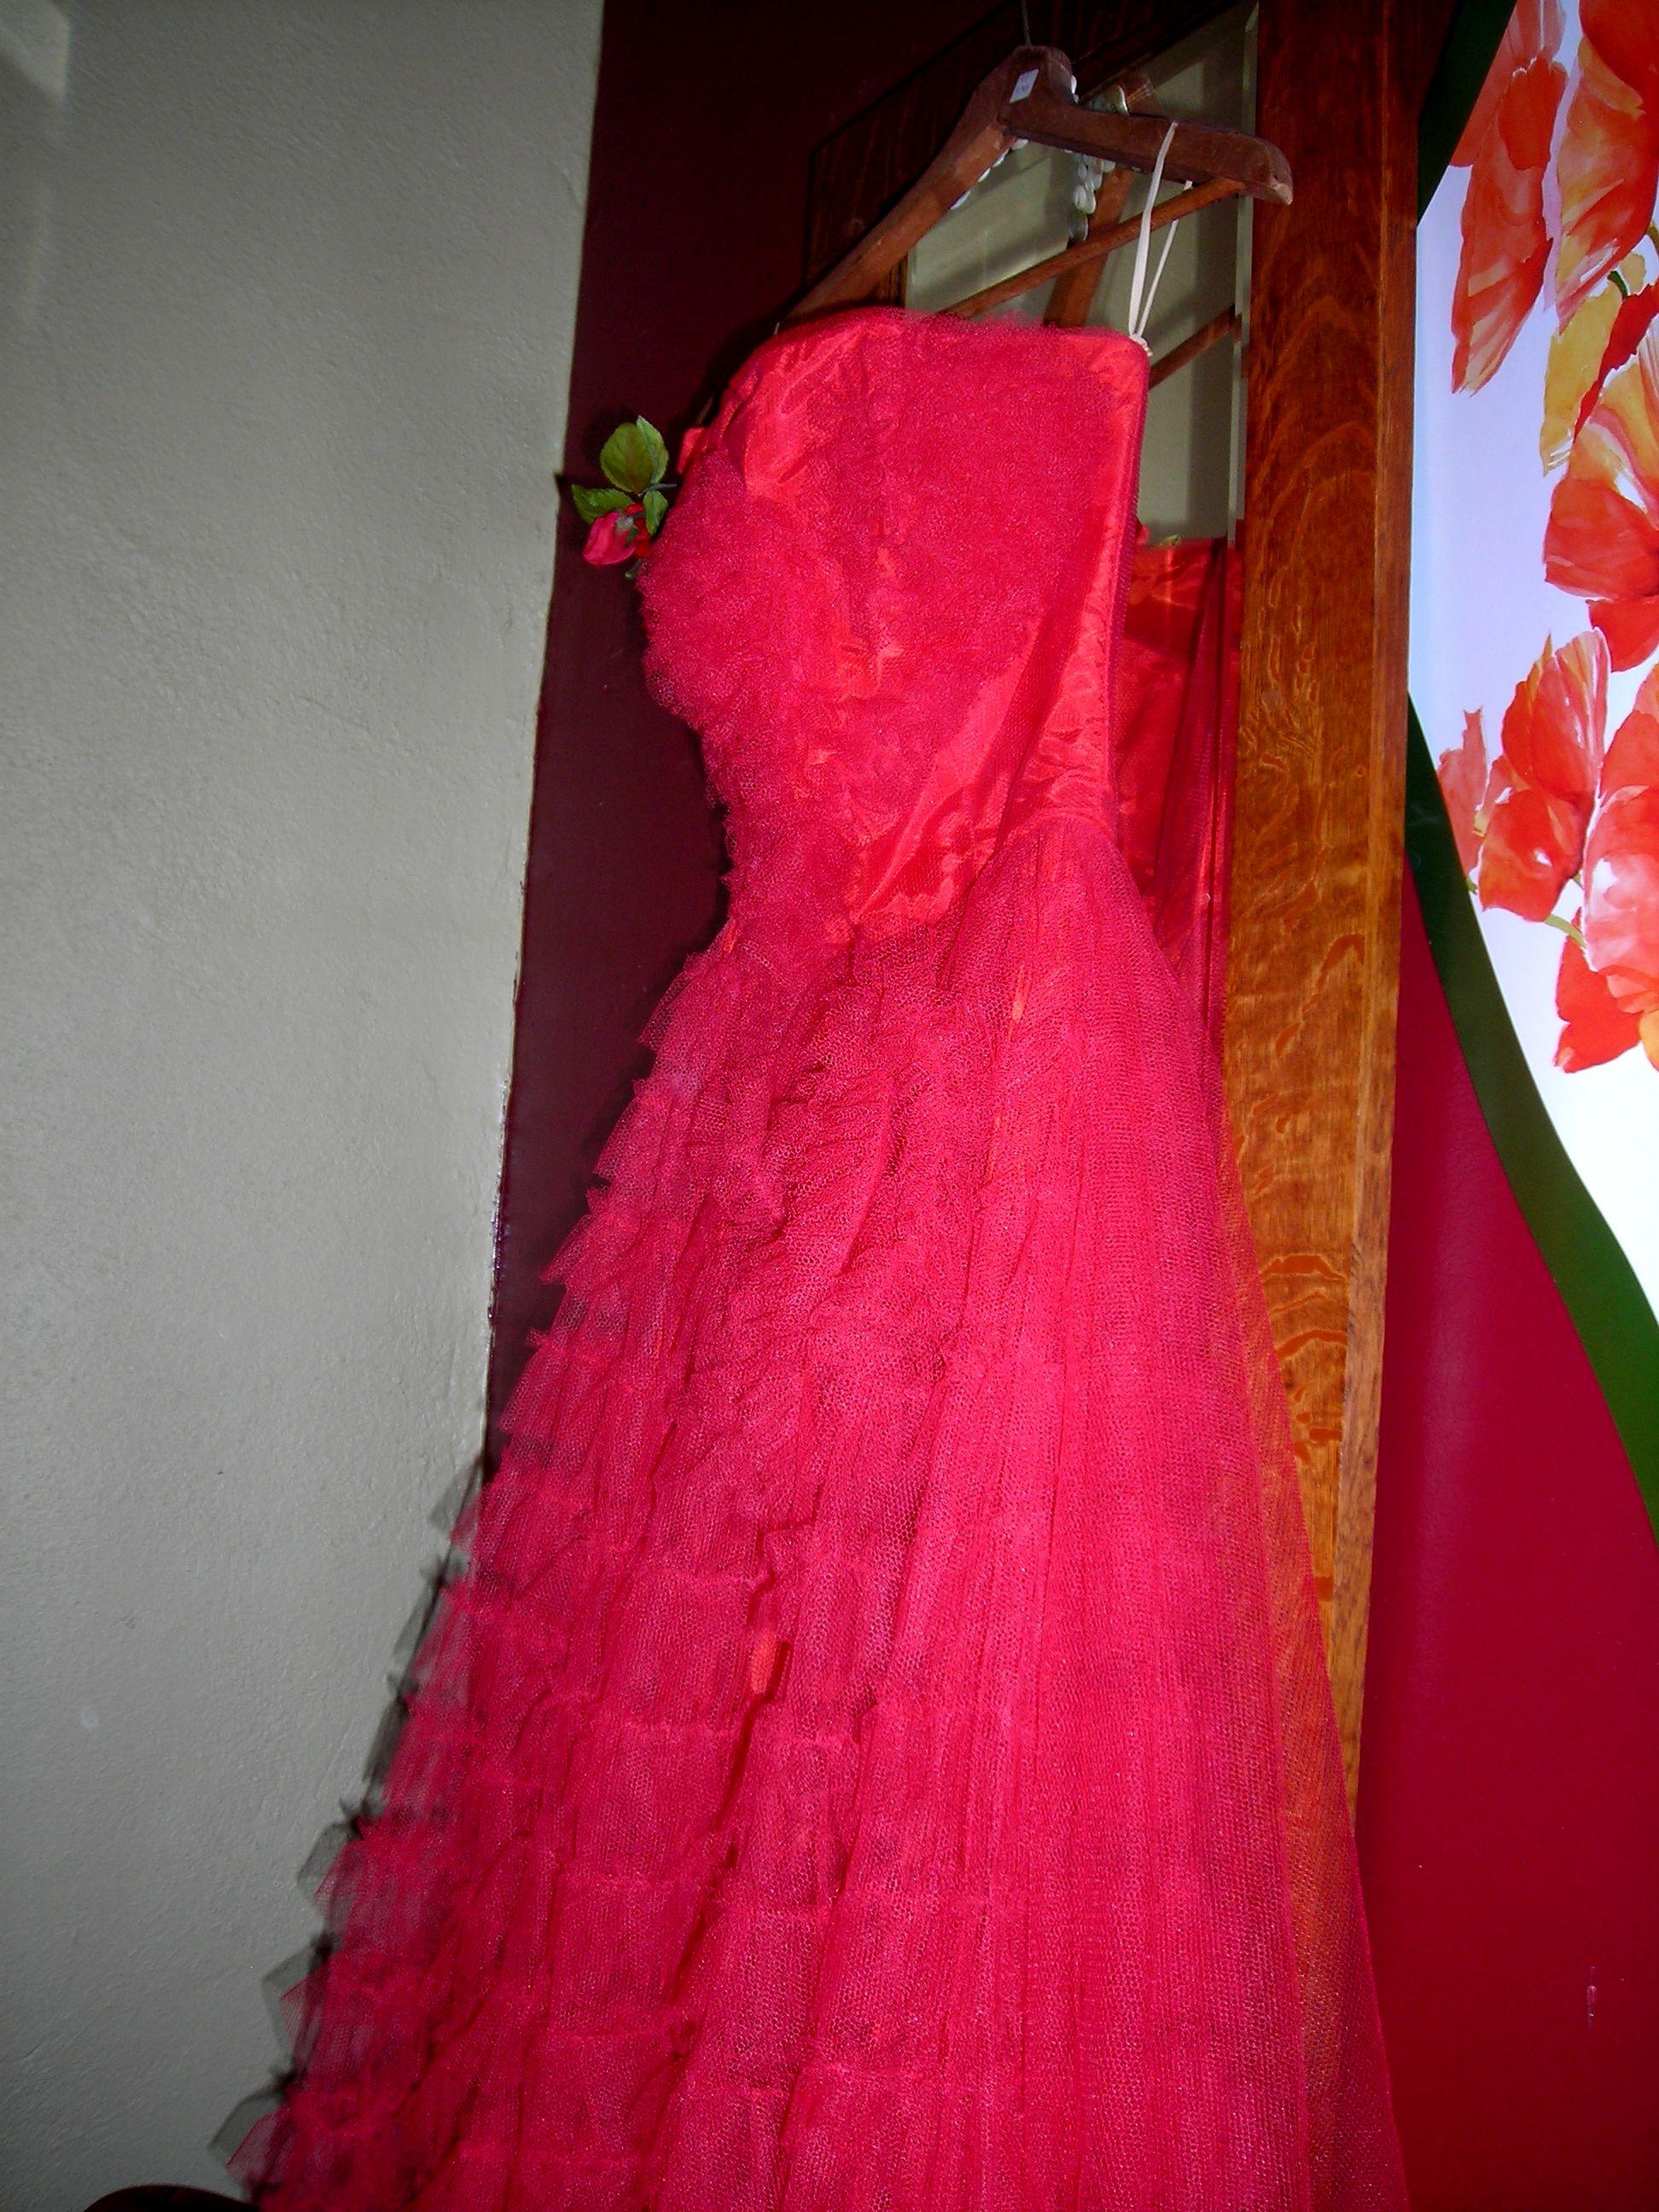 red fru fru dress in the little girls' room!